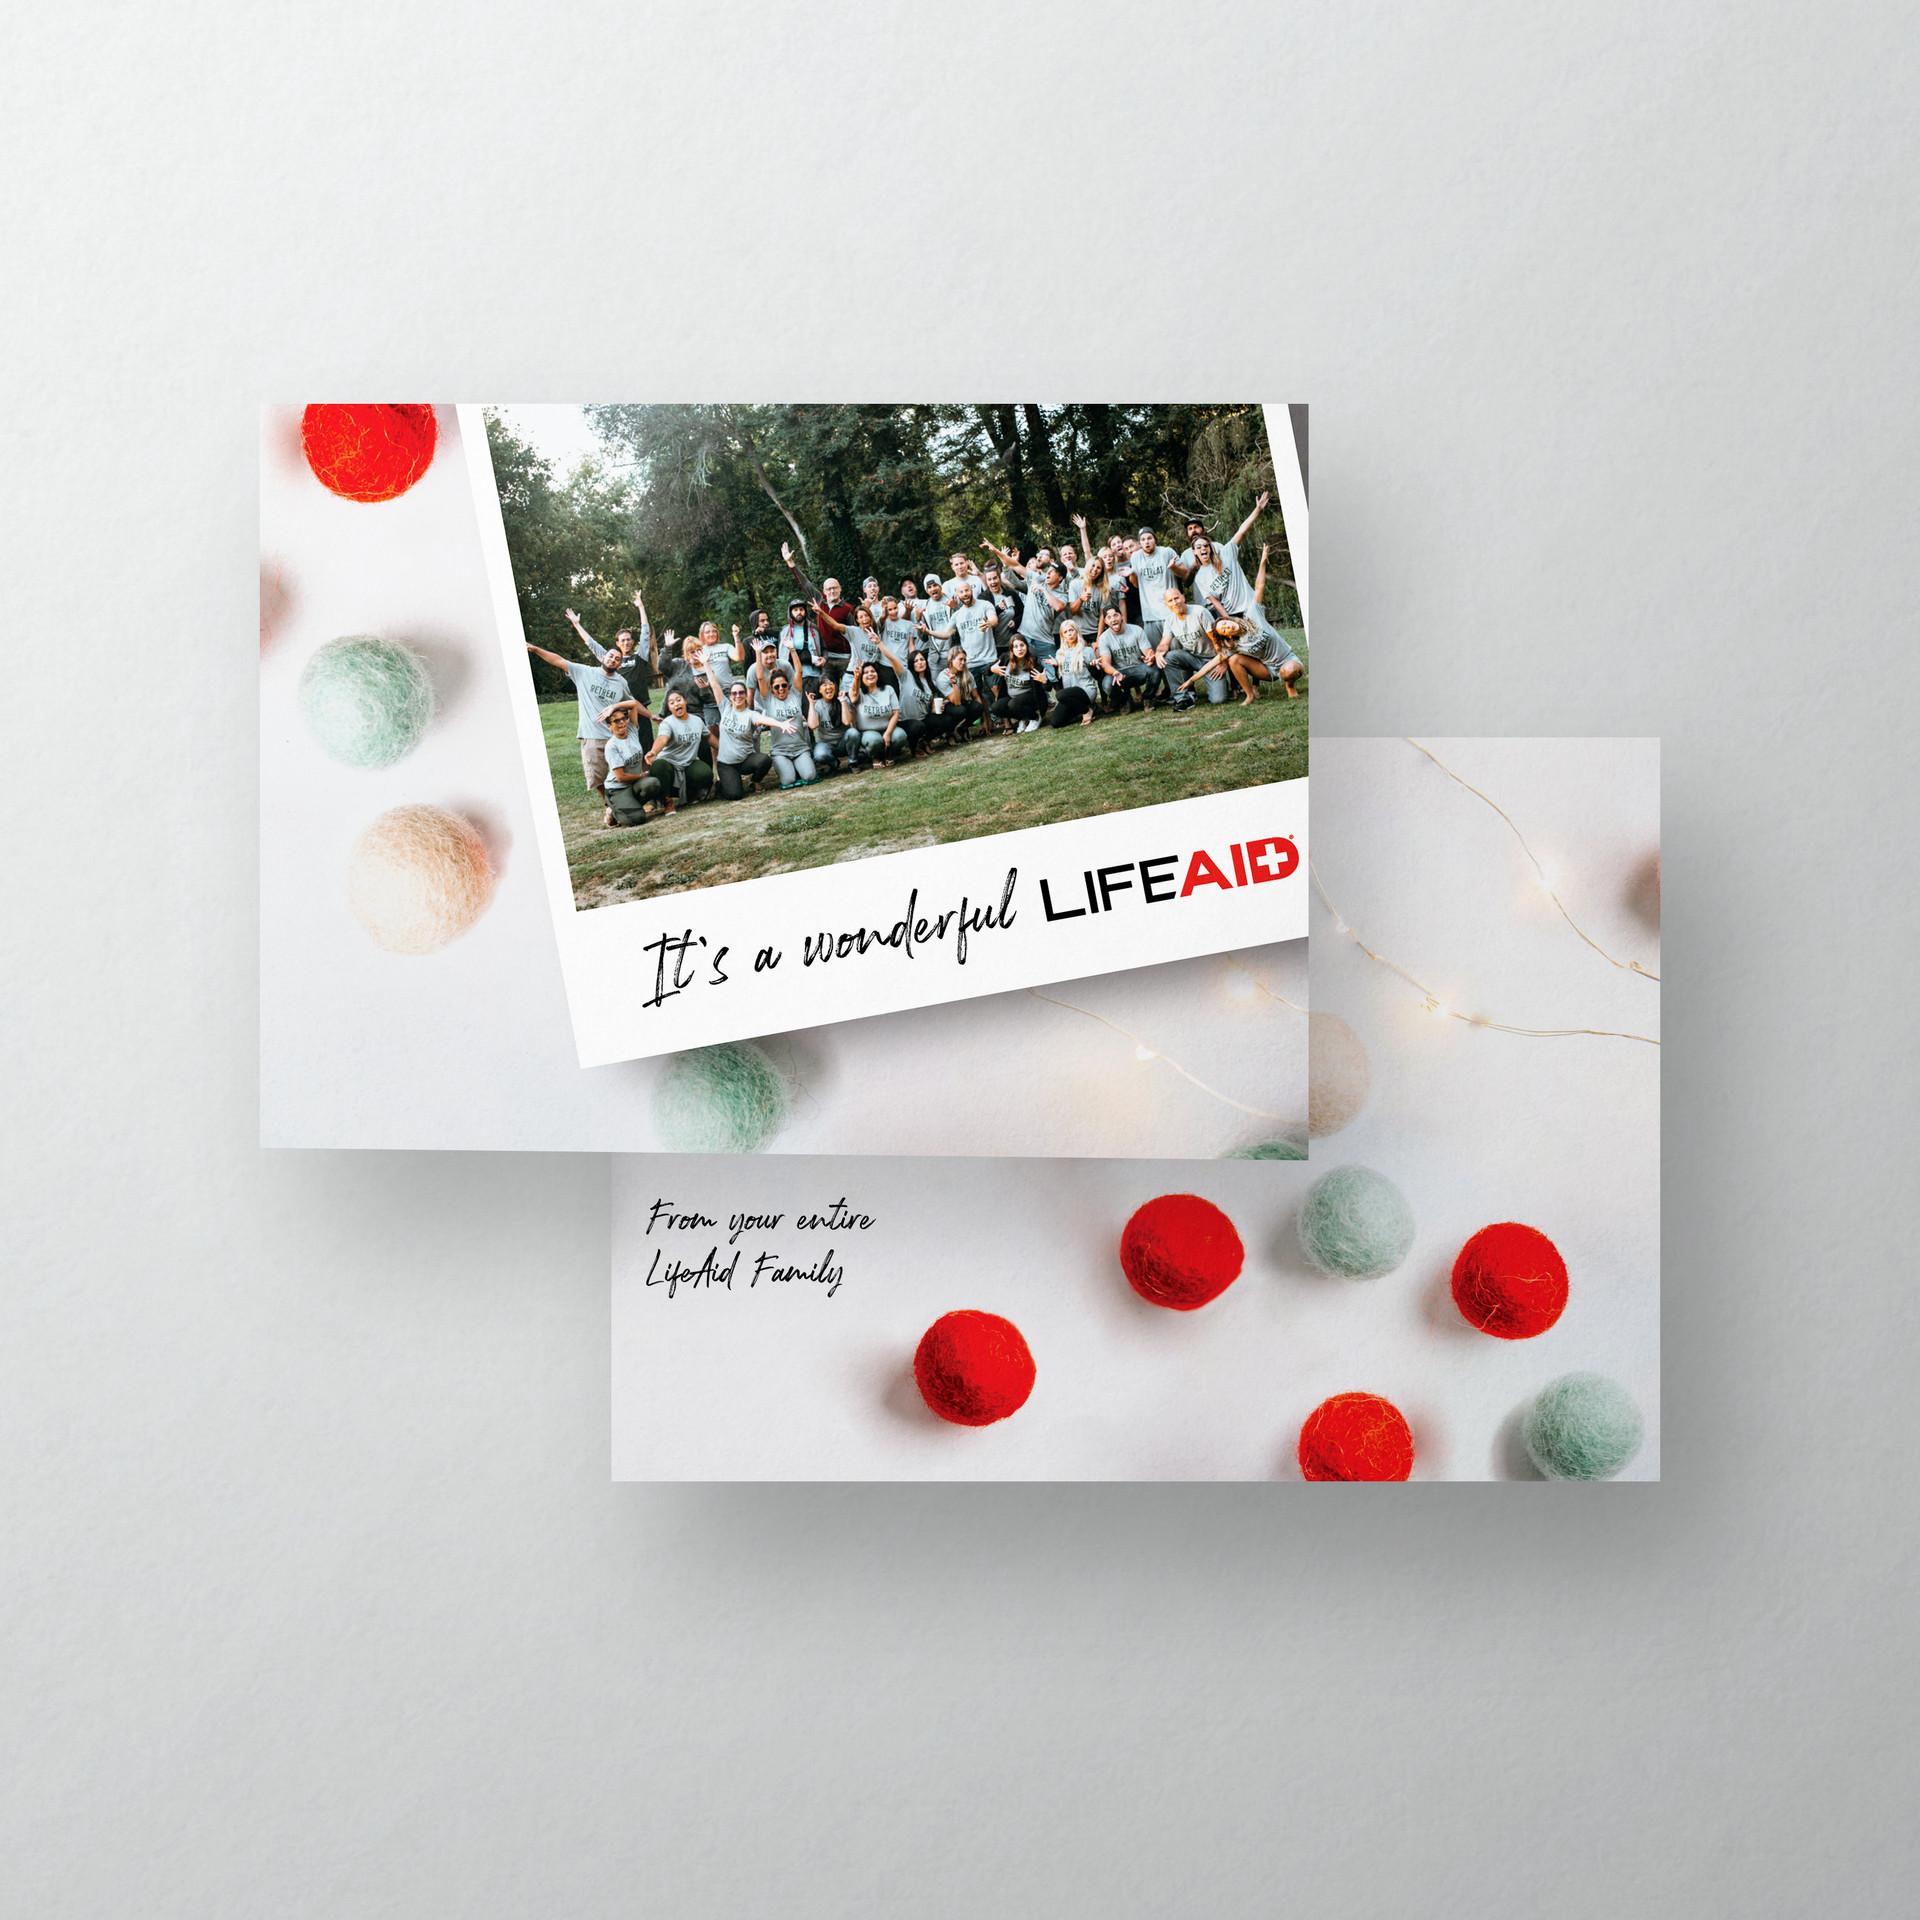 lifeaid holiday card